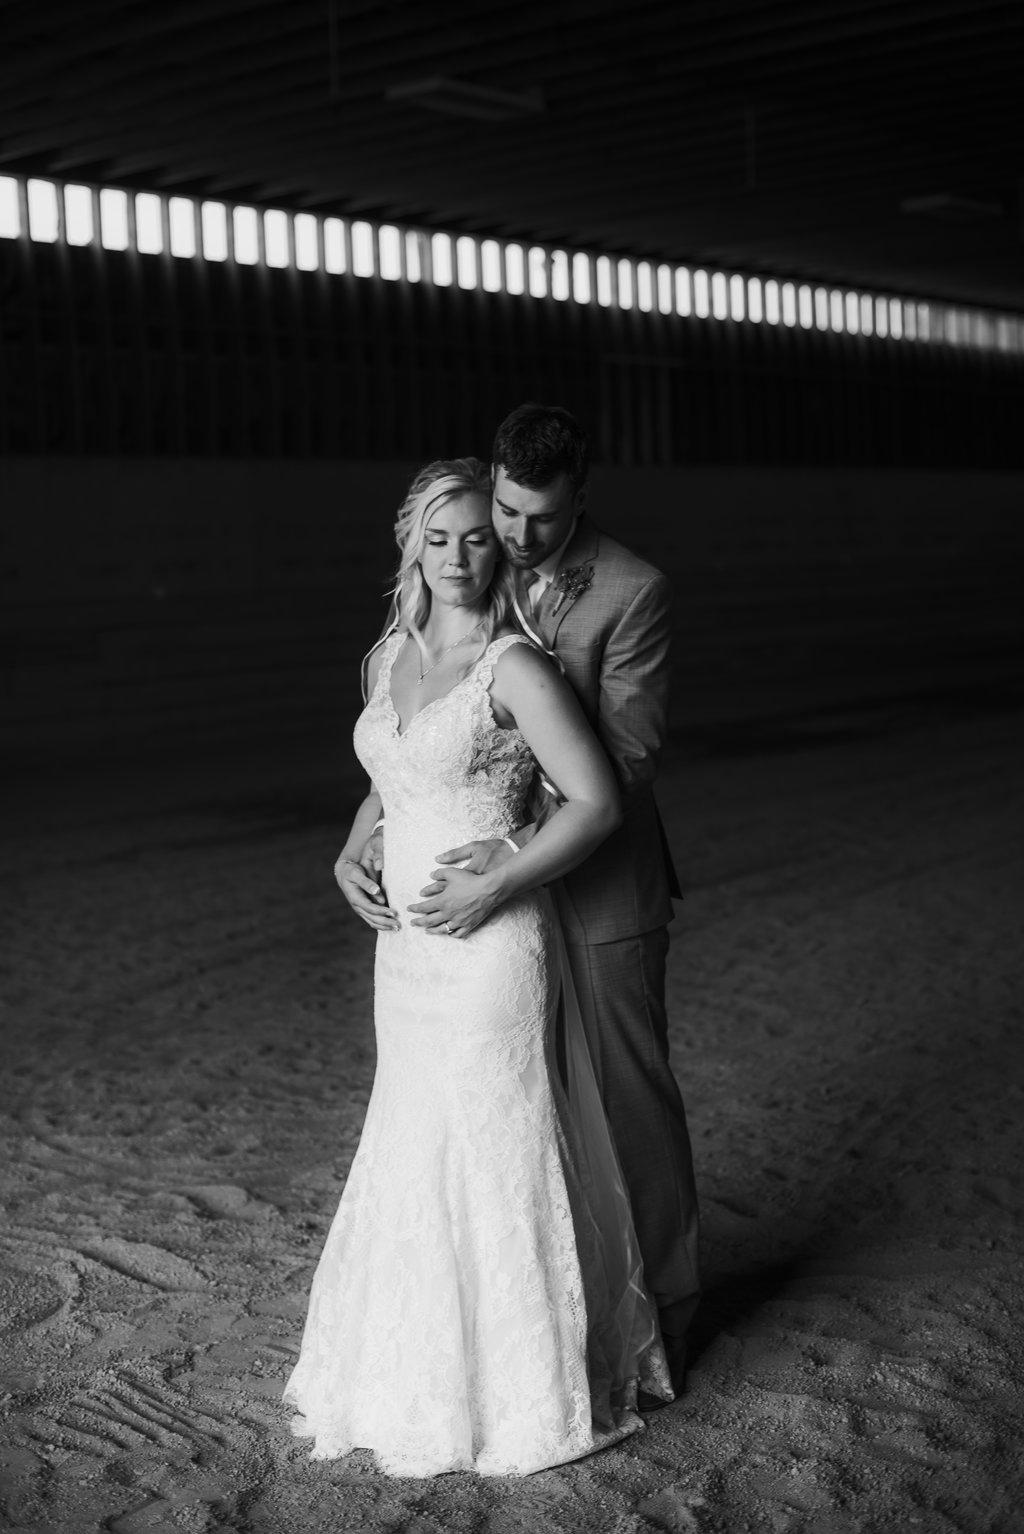 Brody&Sarah_Portraits-48.jpg